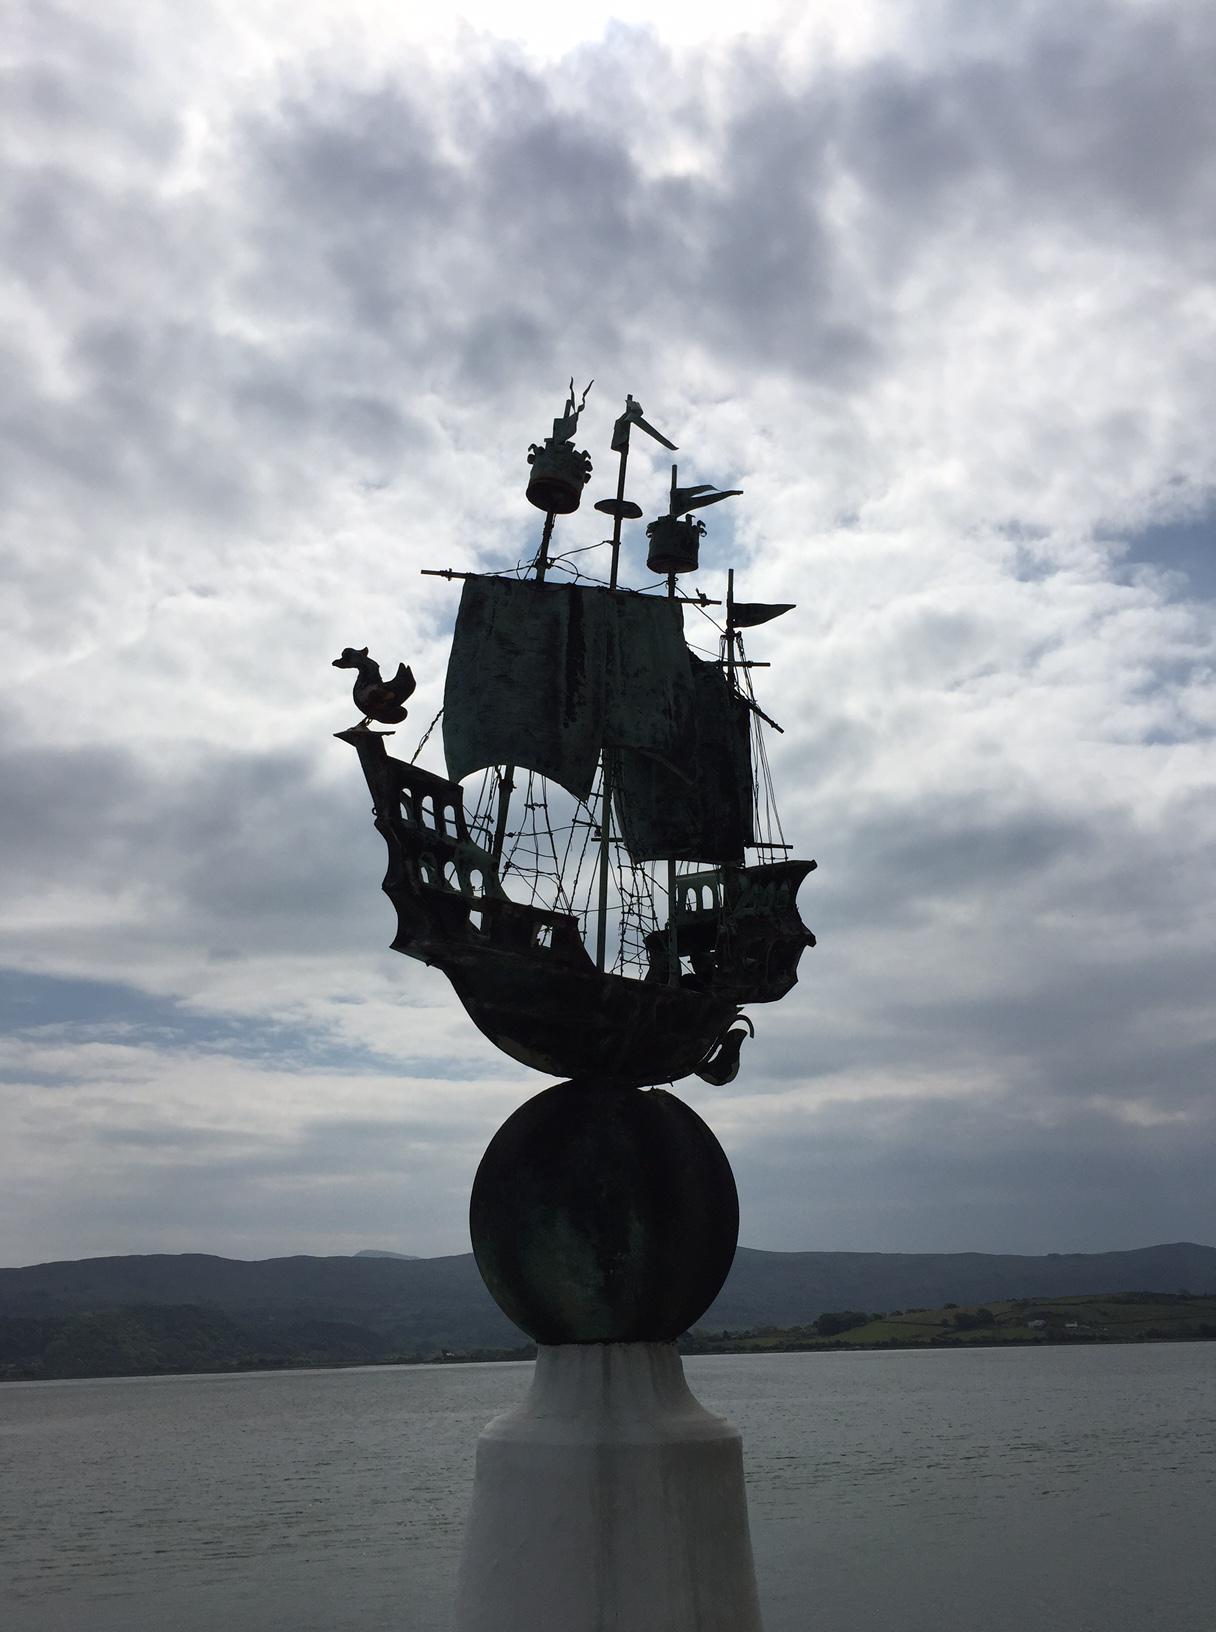 Portmeirion Ship on ball